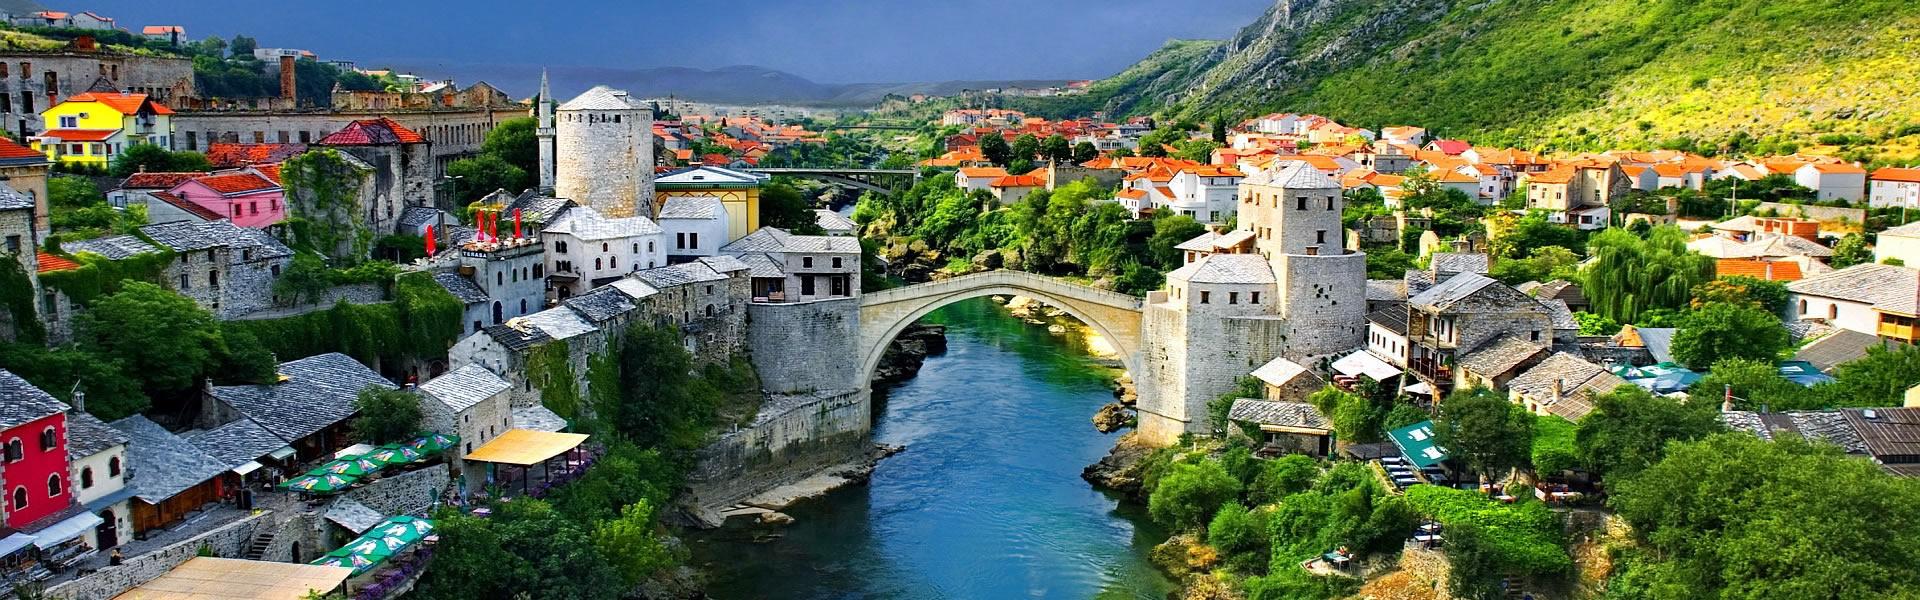 pont-medieval-mostar-destination-touristique-bosnie